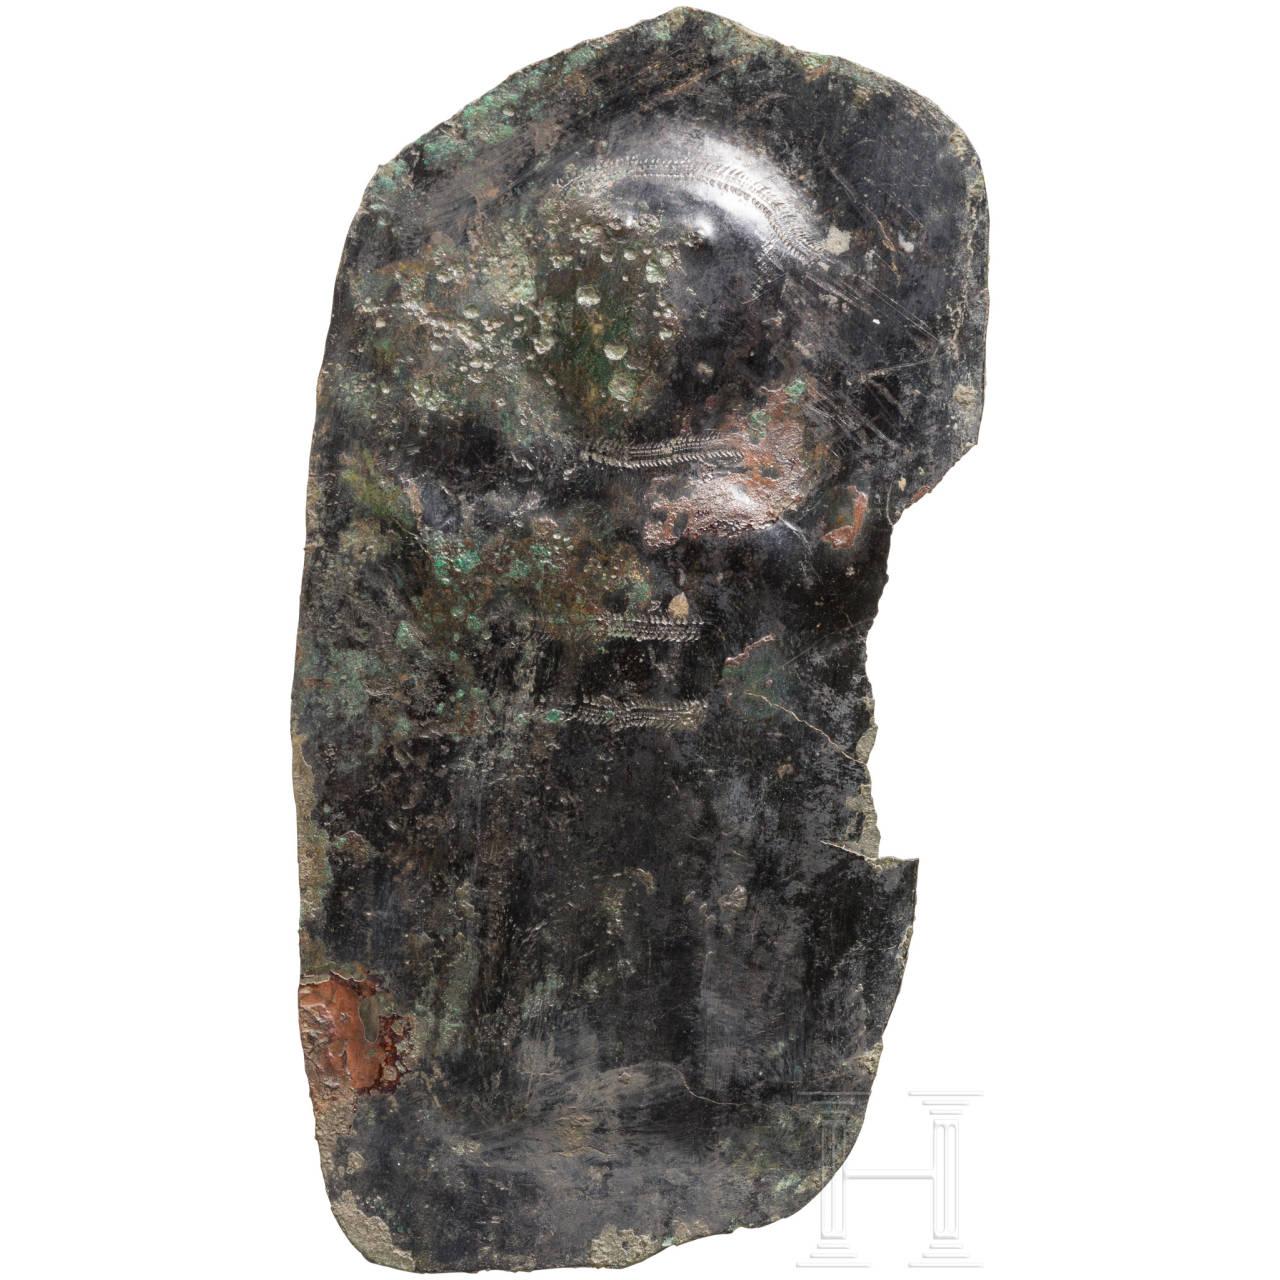 Votivblech mit Adorant, urartäisch, 8. Jhdt. v. Chr.